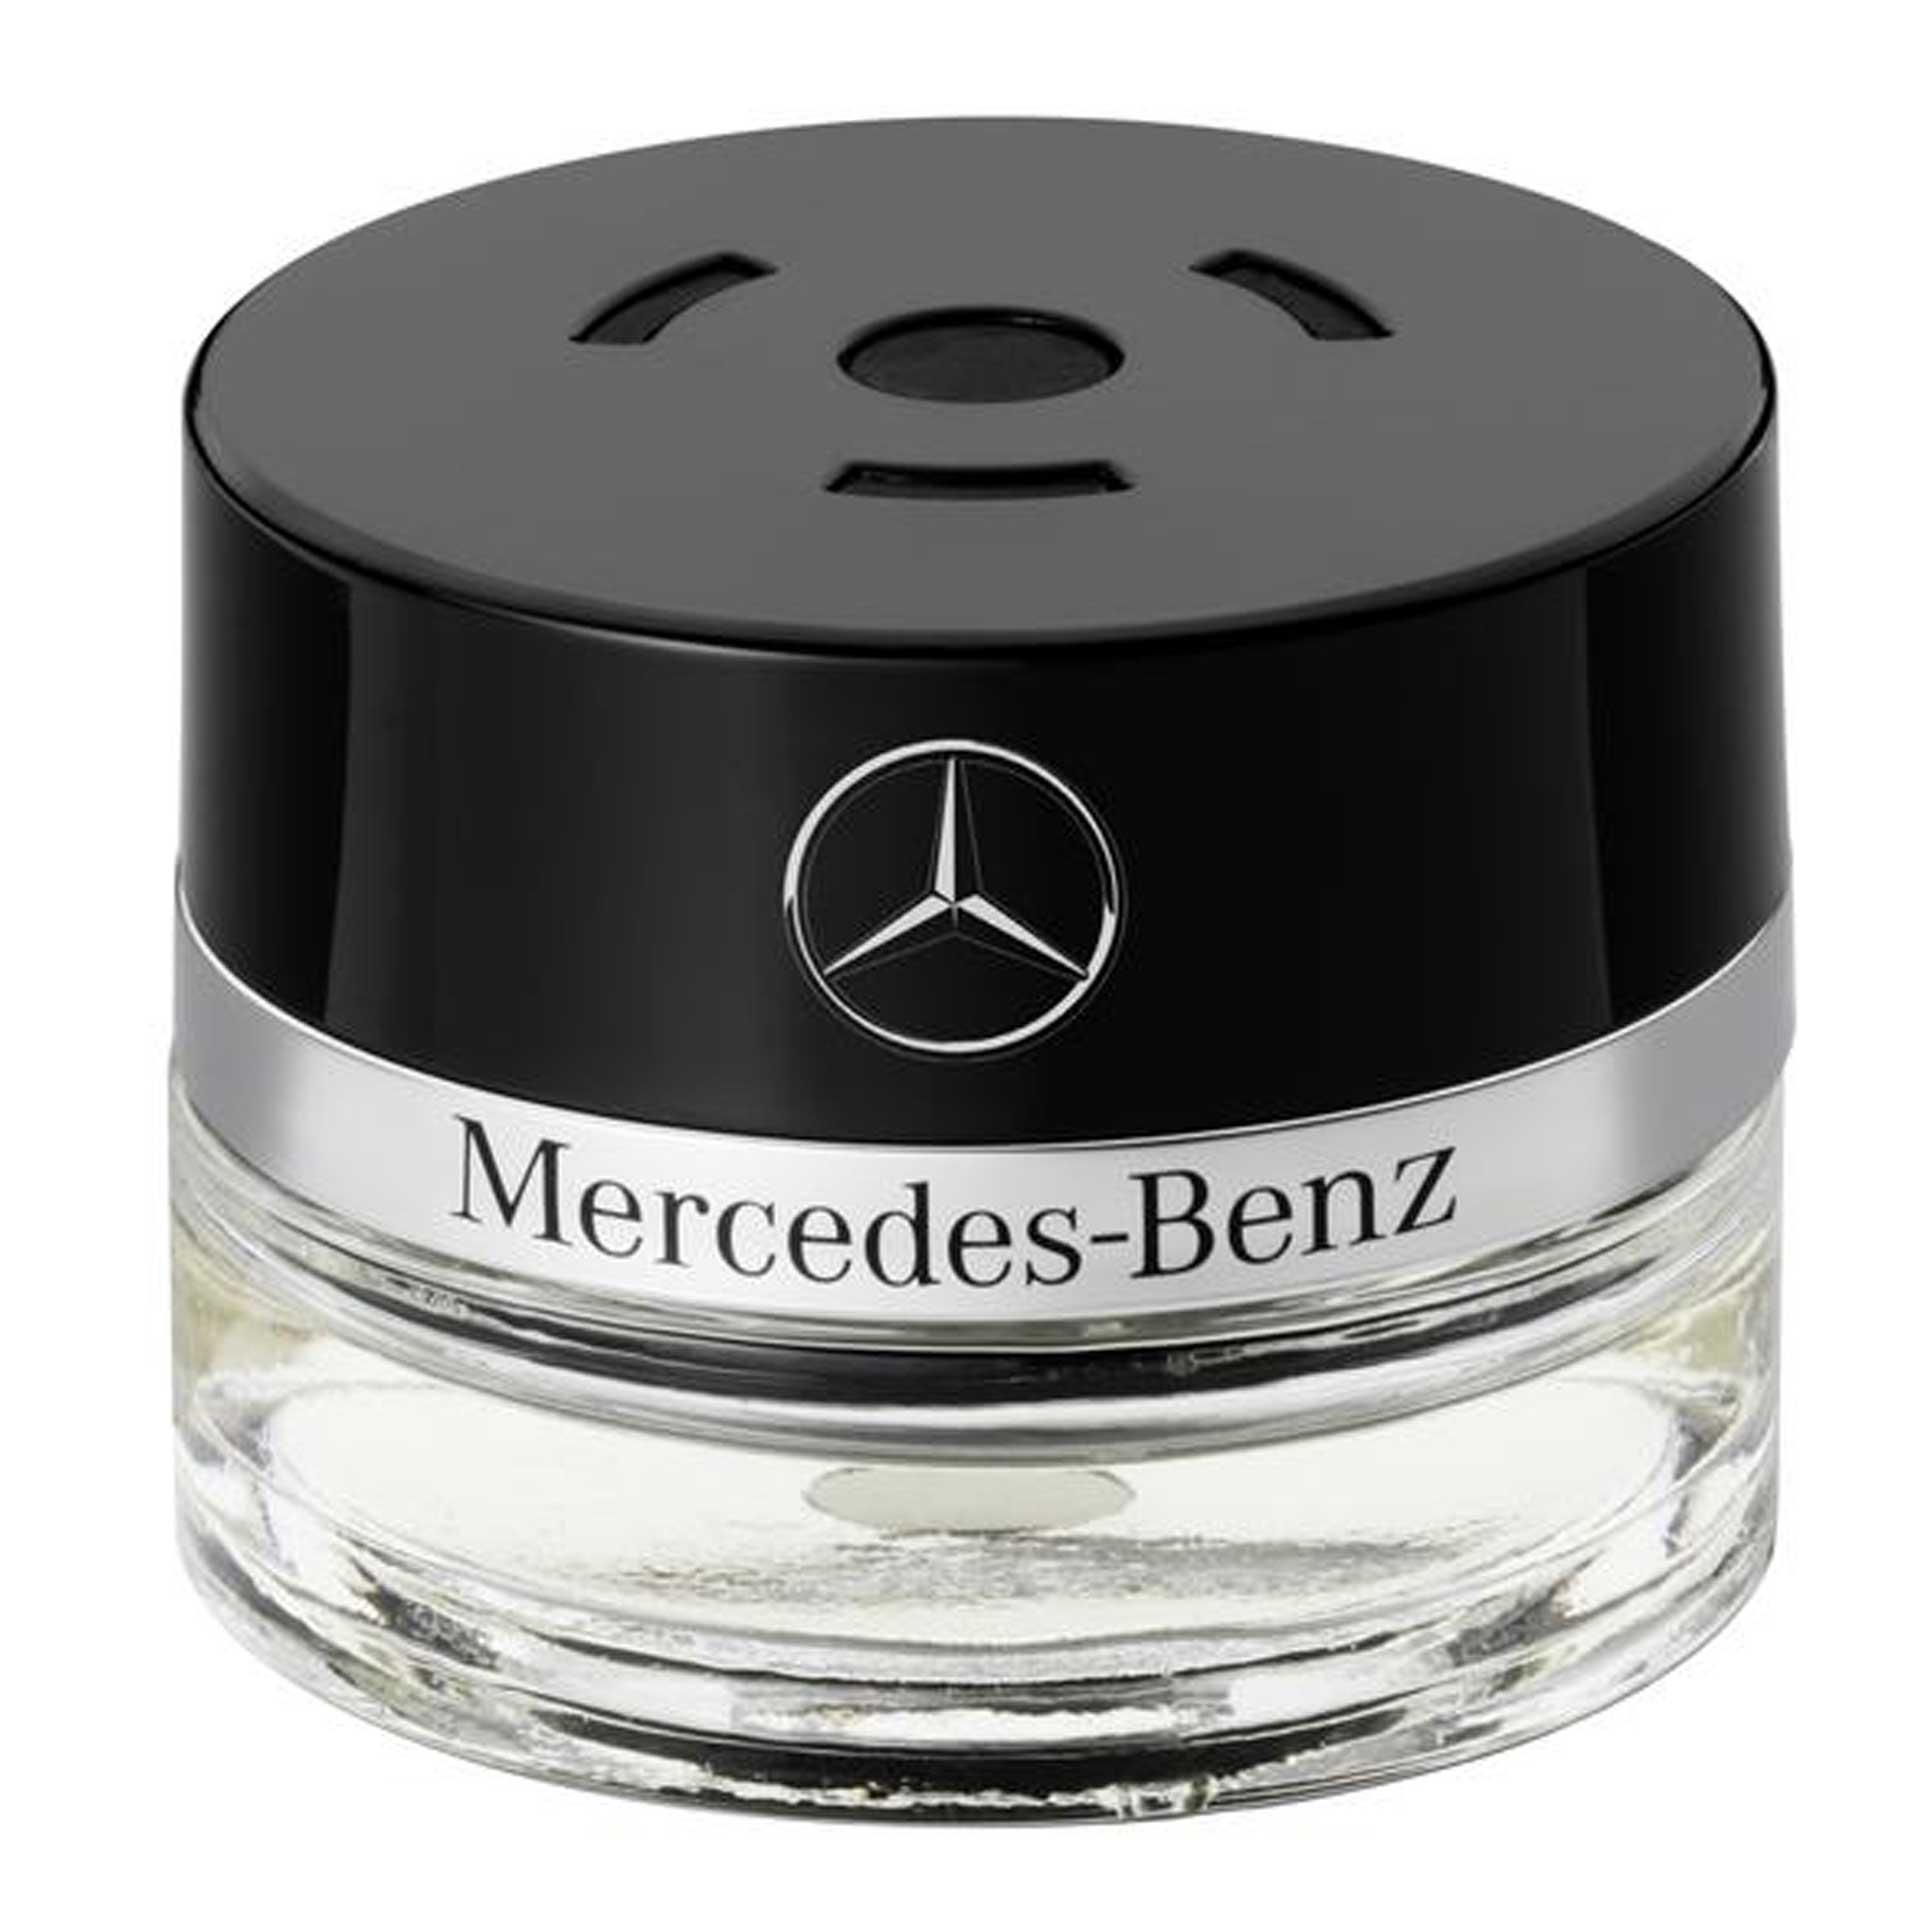 Mercedes-Benz Flakon 15 ml PACIFIC MOOD  für AIR-BALANCE Paket